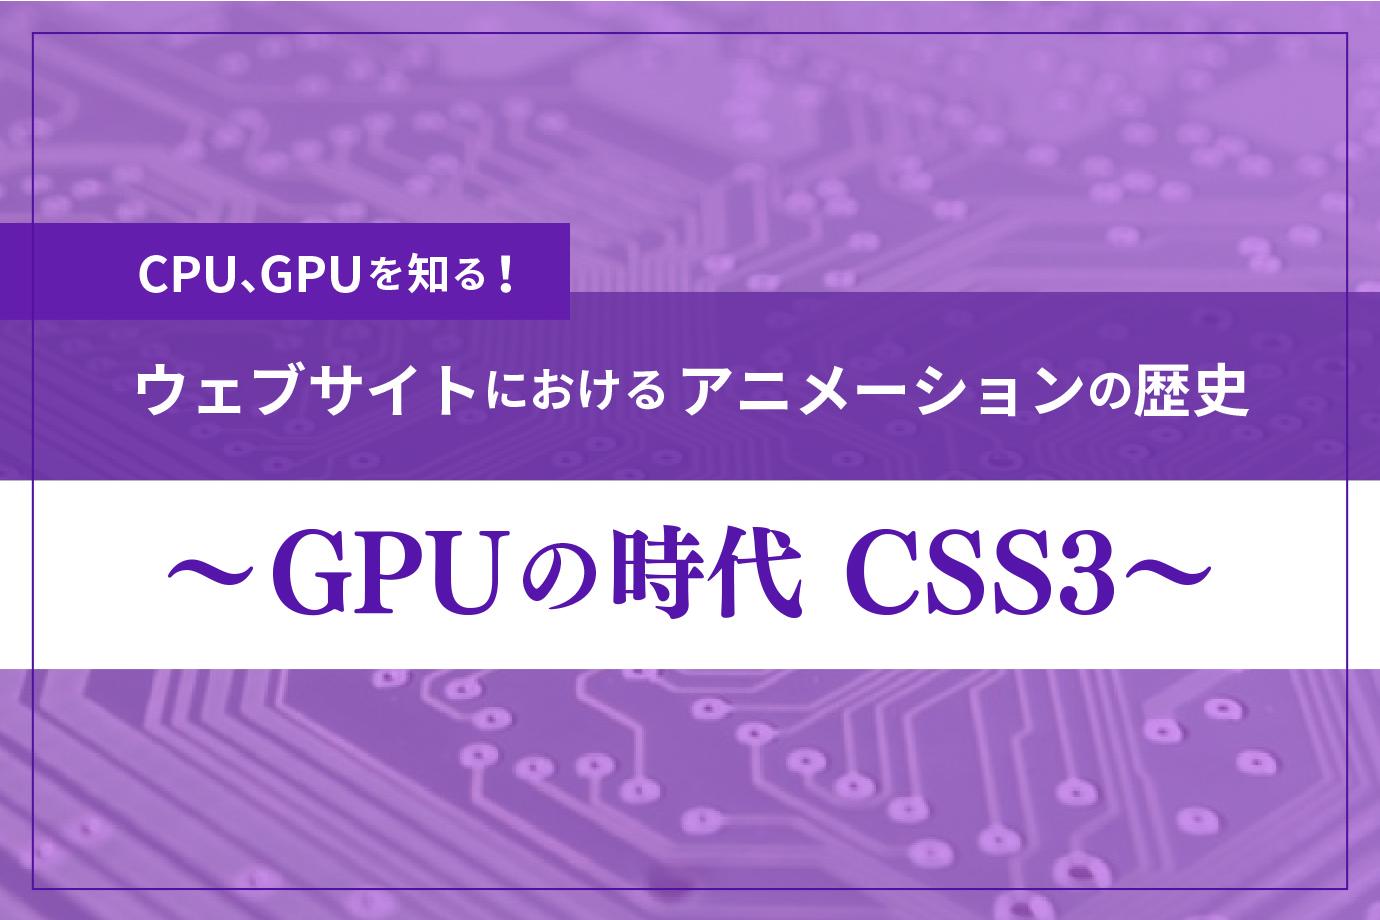 CPU、GPUを知る!『ウェブサイトにおけるアニメーションの歴史 〜GPUの時代 CSS3〜』